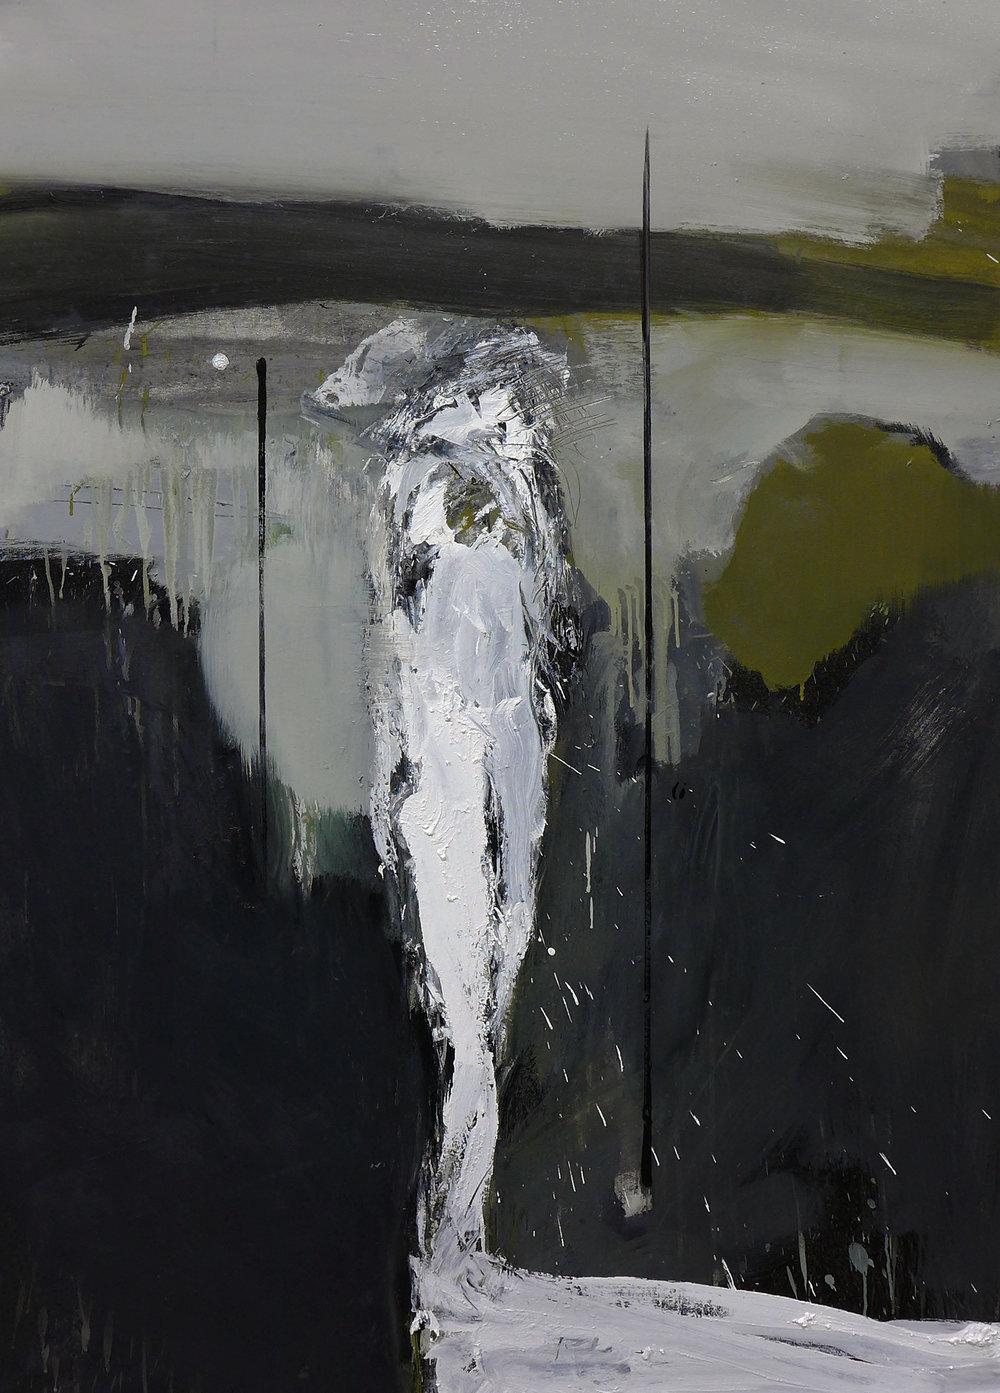 Hombre sin título 2,      2016  Oil on canvas  140 x 100 cm